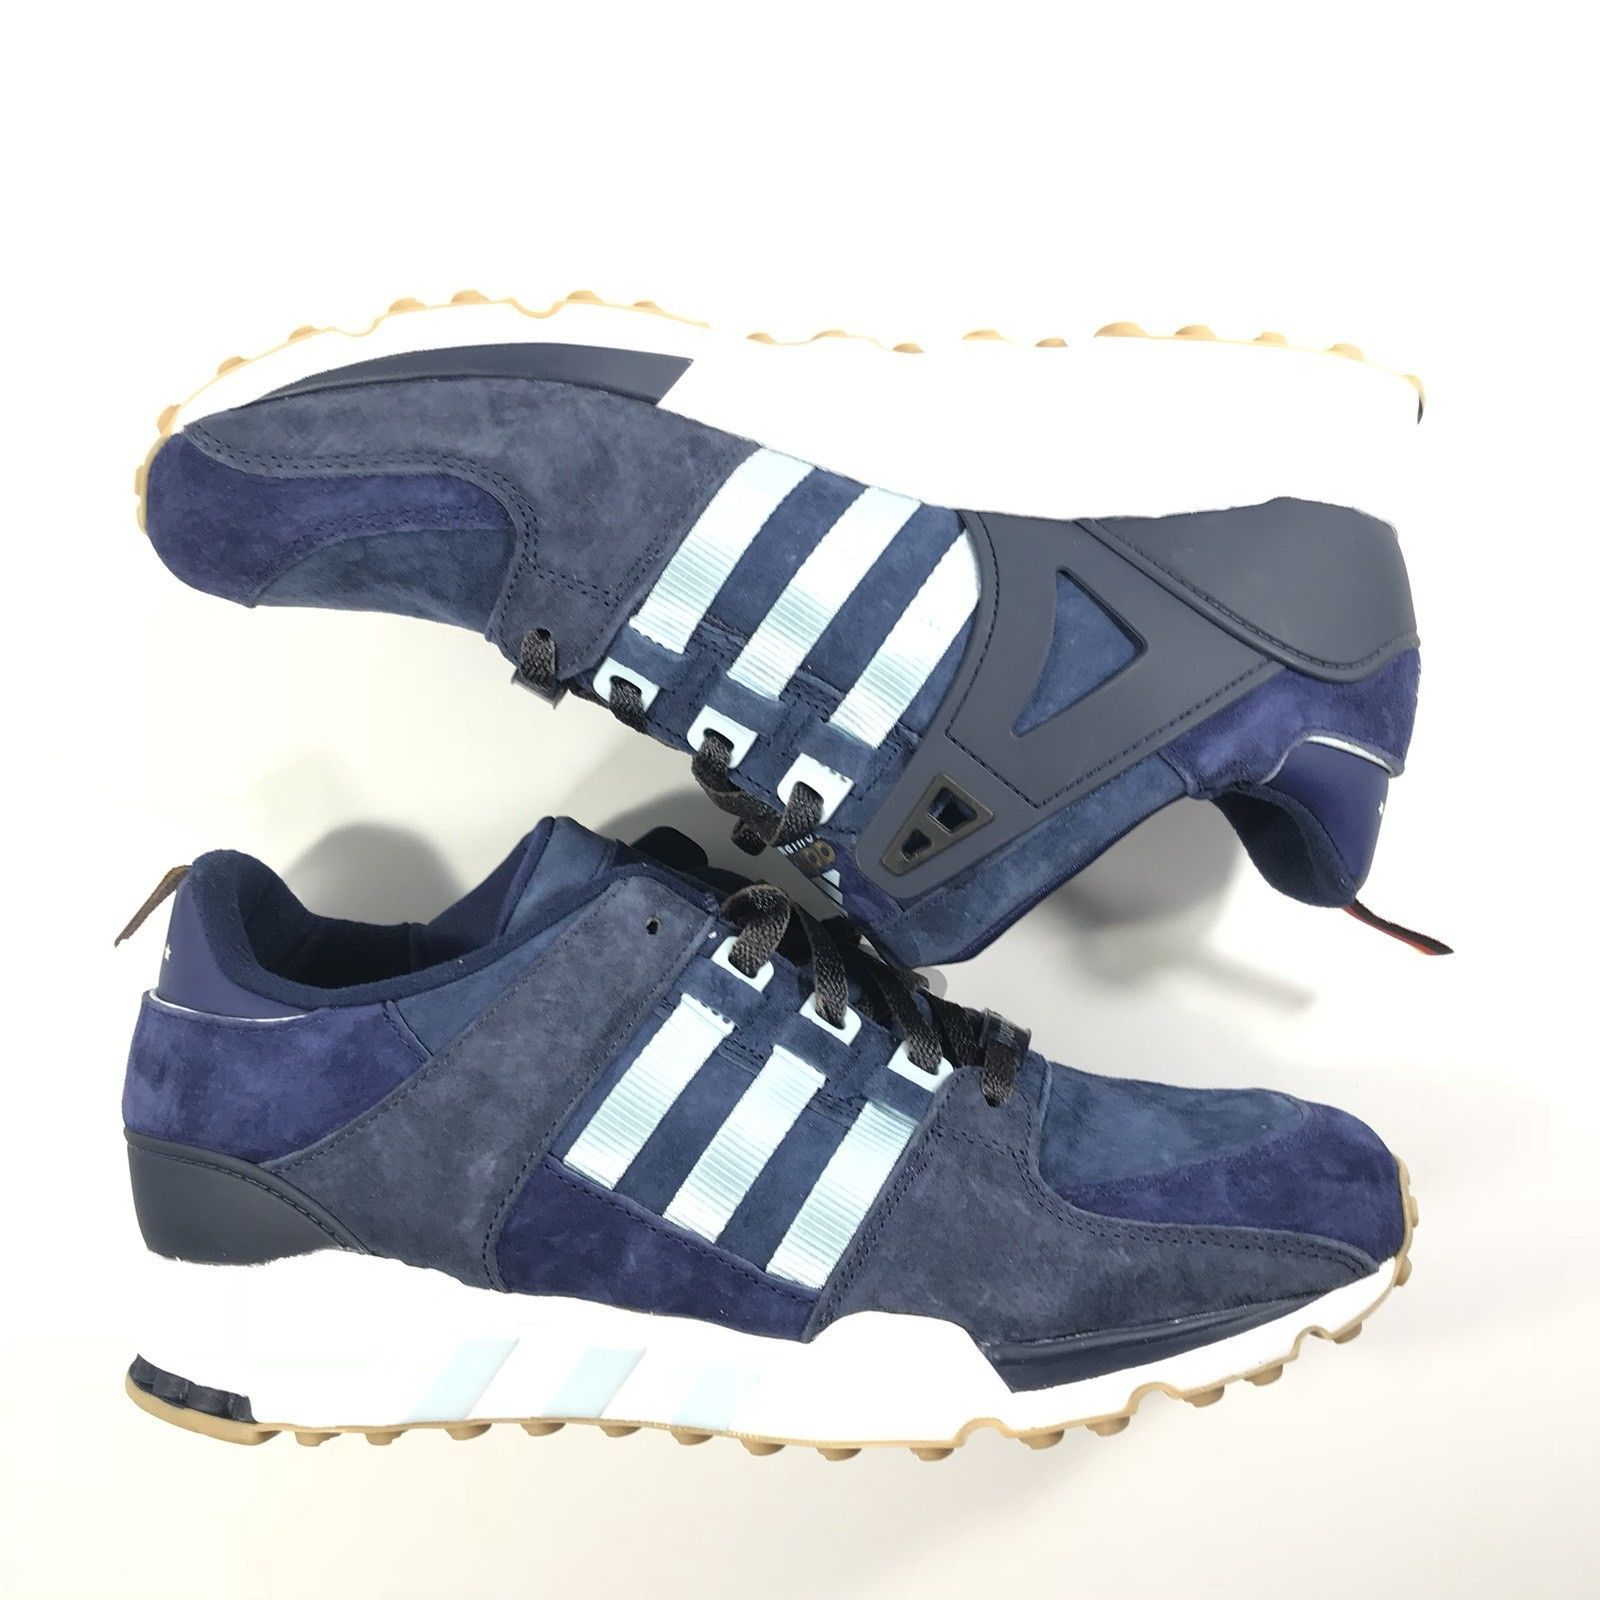 Adidas EQT 93 Equipment Berlin Marathon LTD Navy/Ice Blue Shoes B27662 Size  10.5